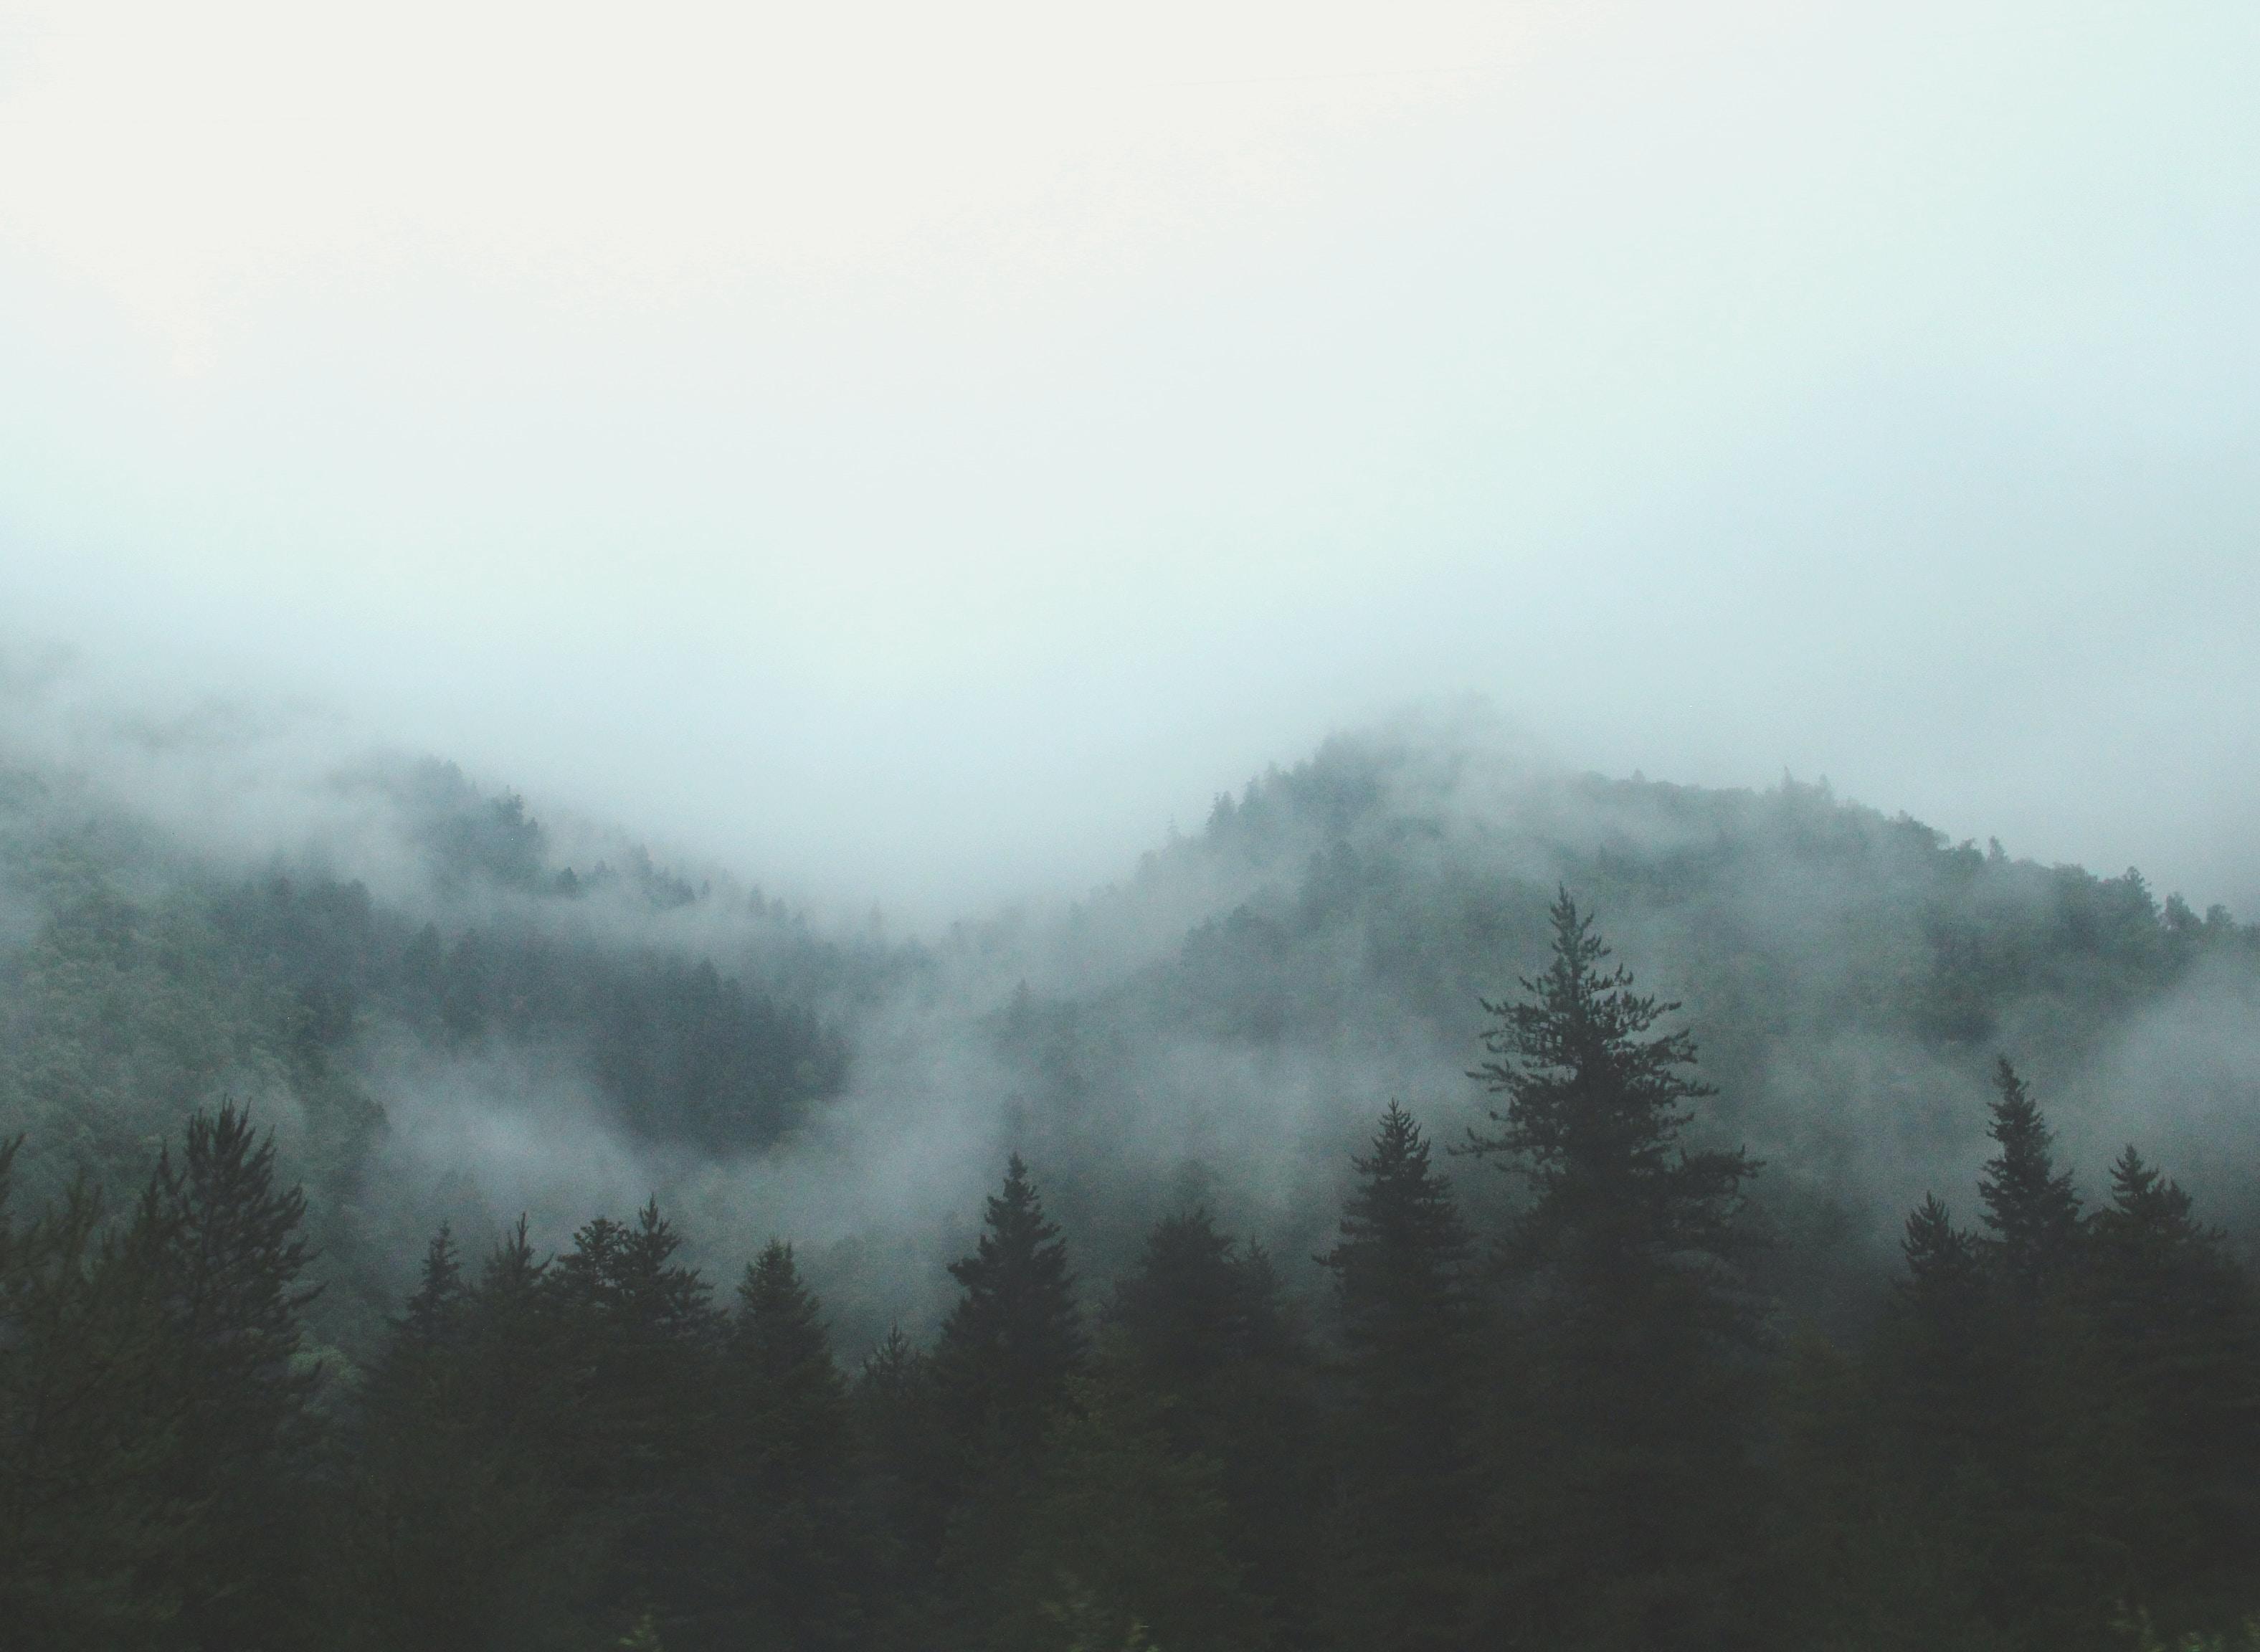 Mist over wooded hills in Jiuzhai Valley National Park